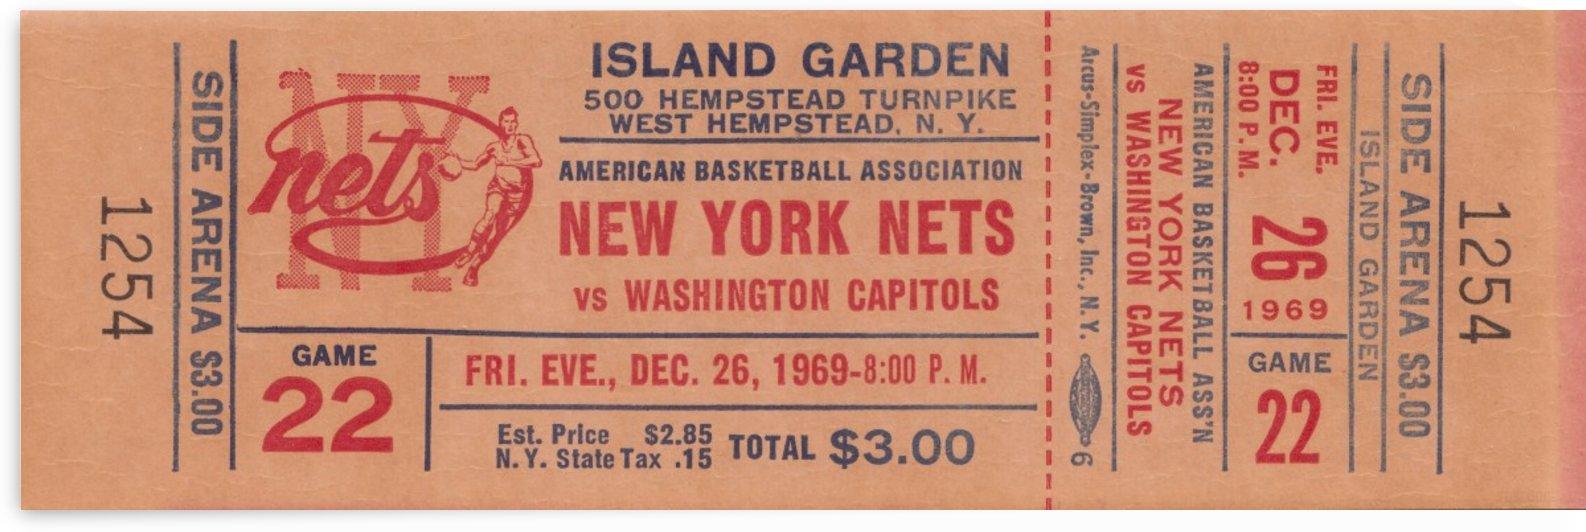 1969 ABA Basketball Season New York Nets vs. Washington Capitols Island Garden Ticket Stub Art by Row One Brand